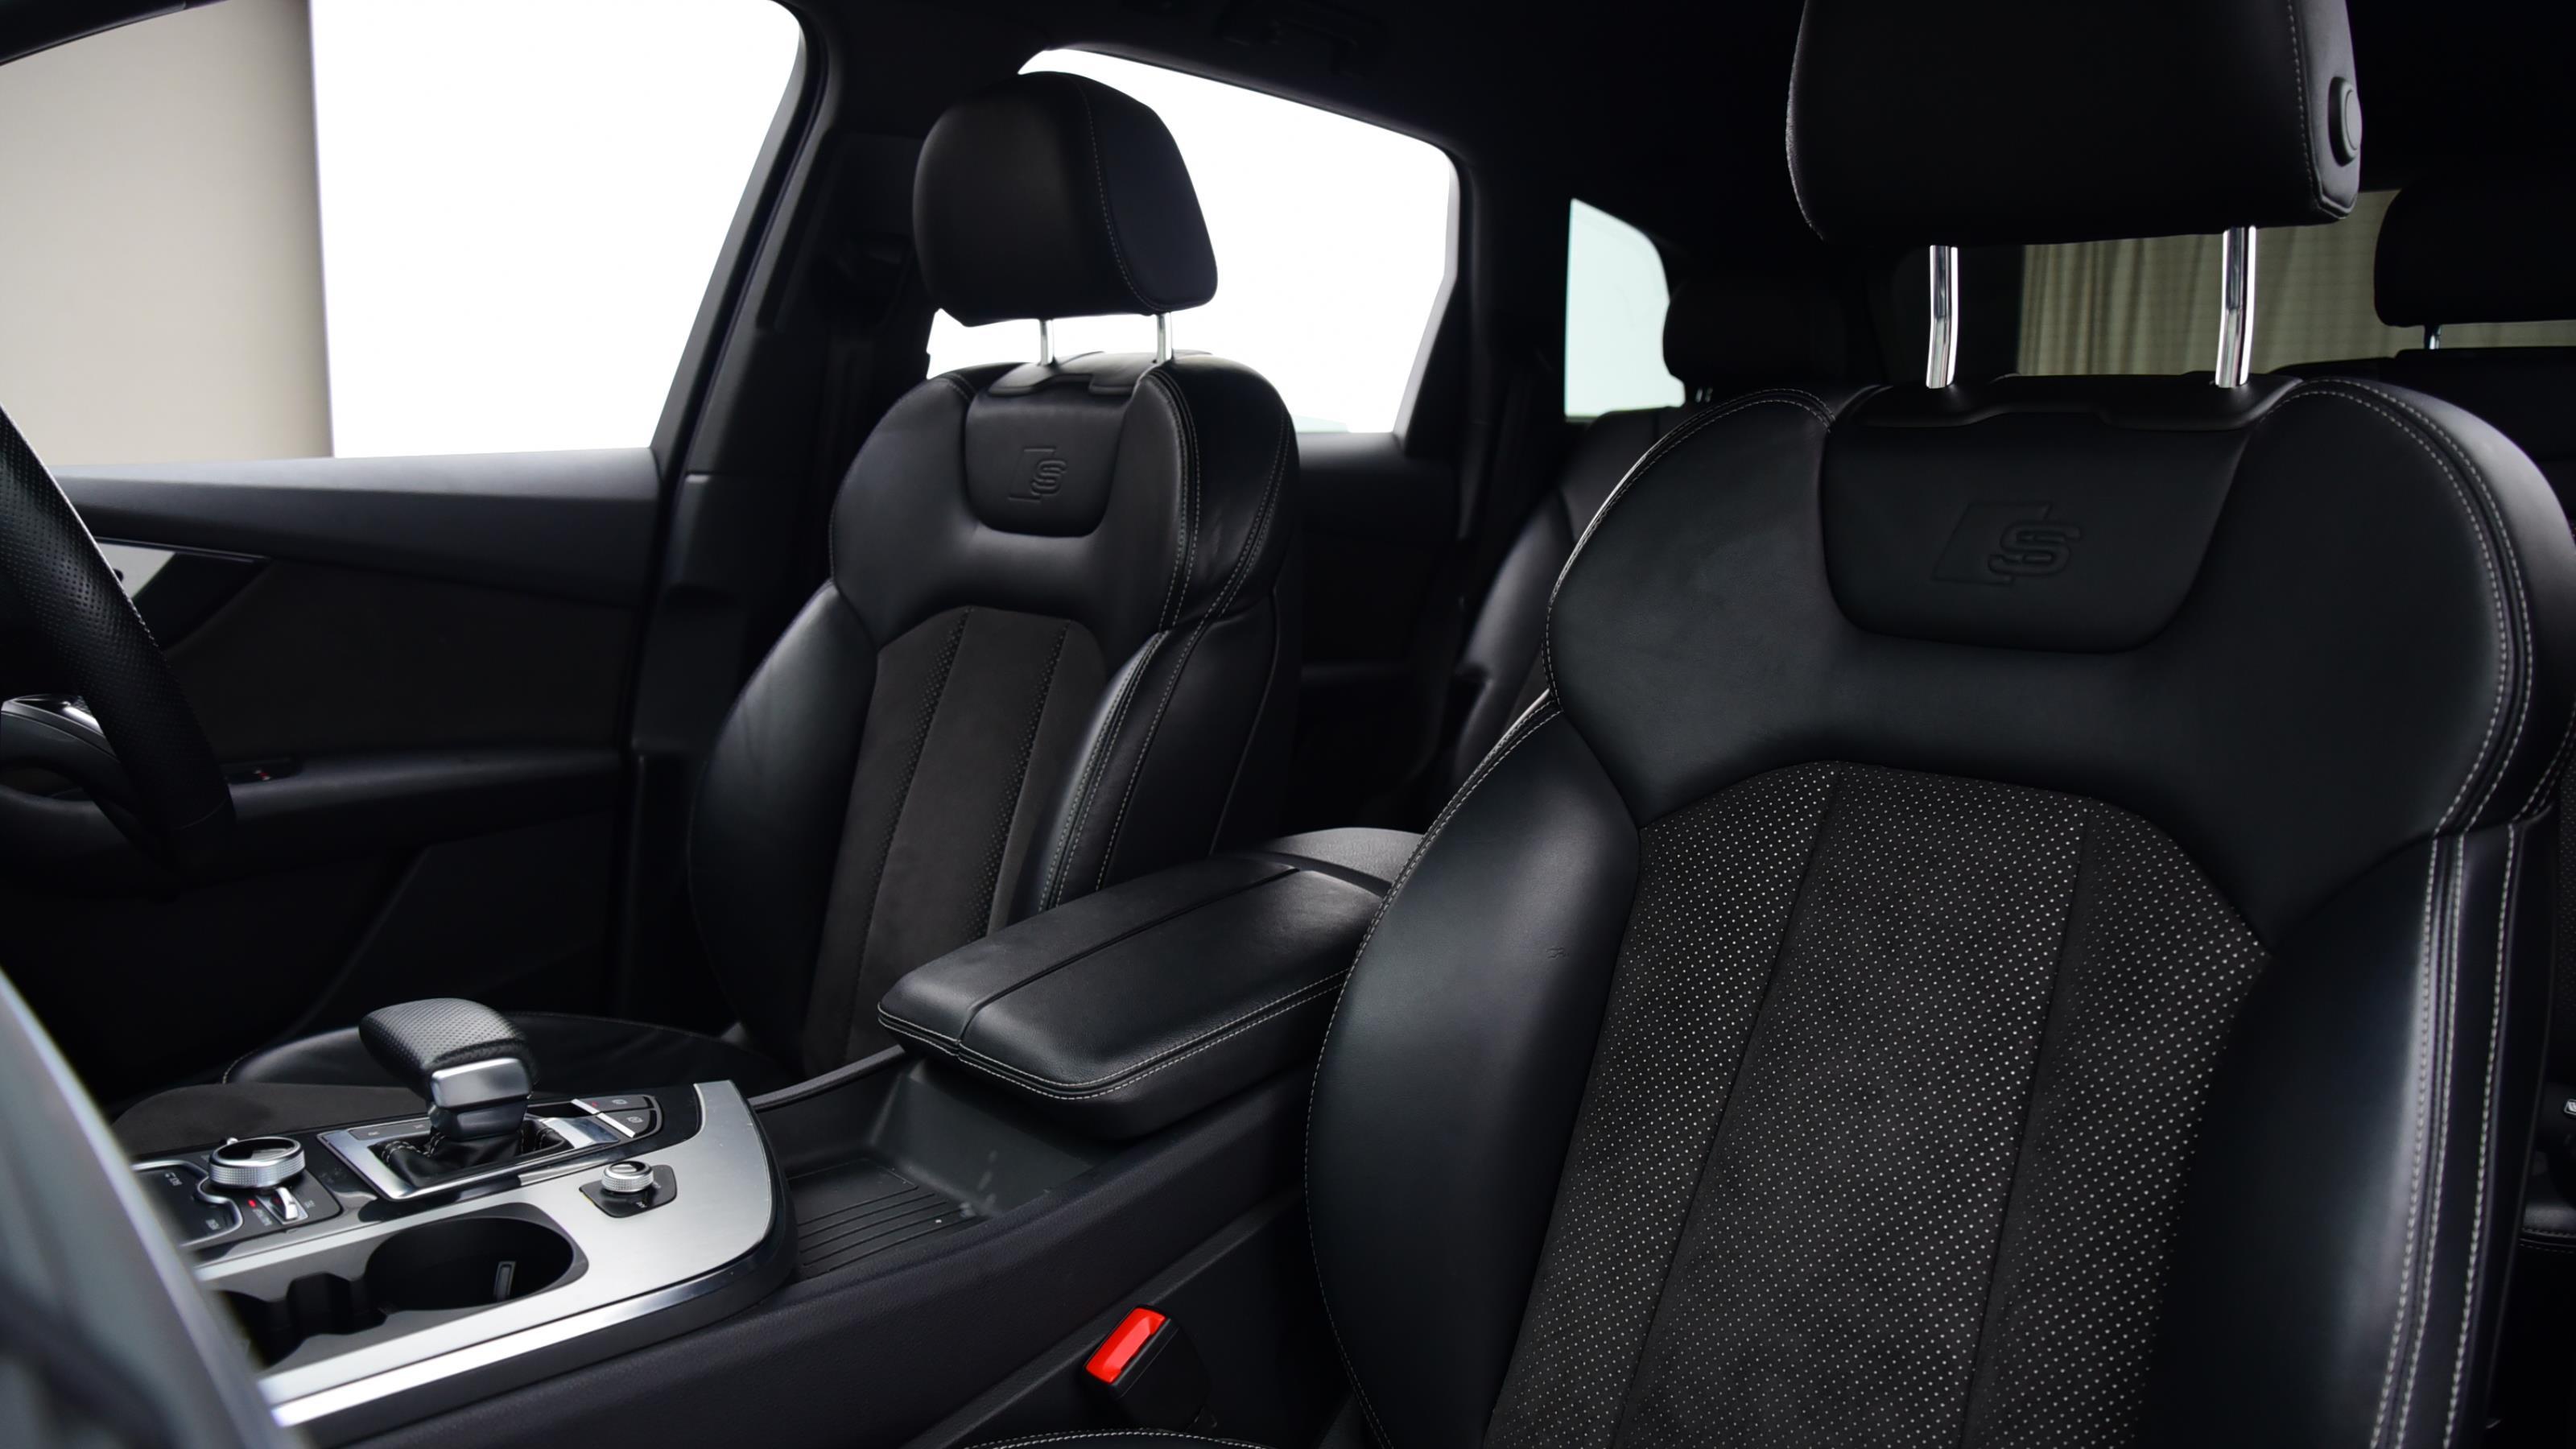 Used 2017 Audi Q7 3.0 TDI Quattro S Line 5dr Tip Auto WHITE at Saxton4x4